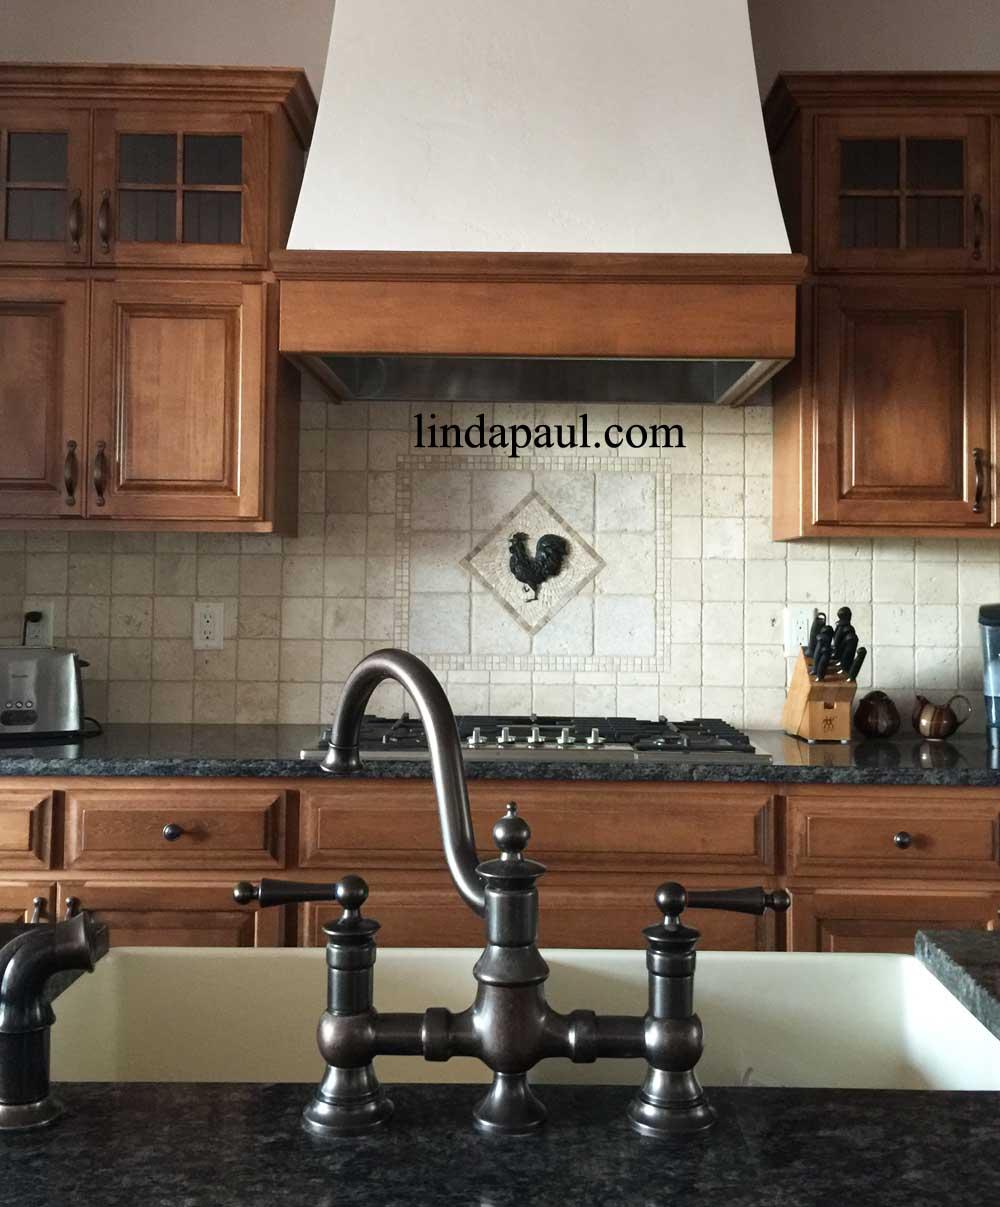 Country Kitchen Tile Backsplash Ideas: Rooster Tile Medallion French Country Kitchen Backsplash Ideas